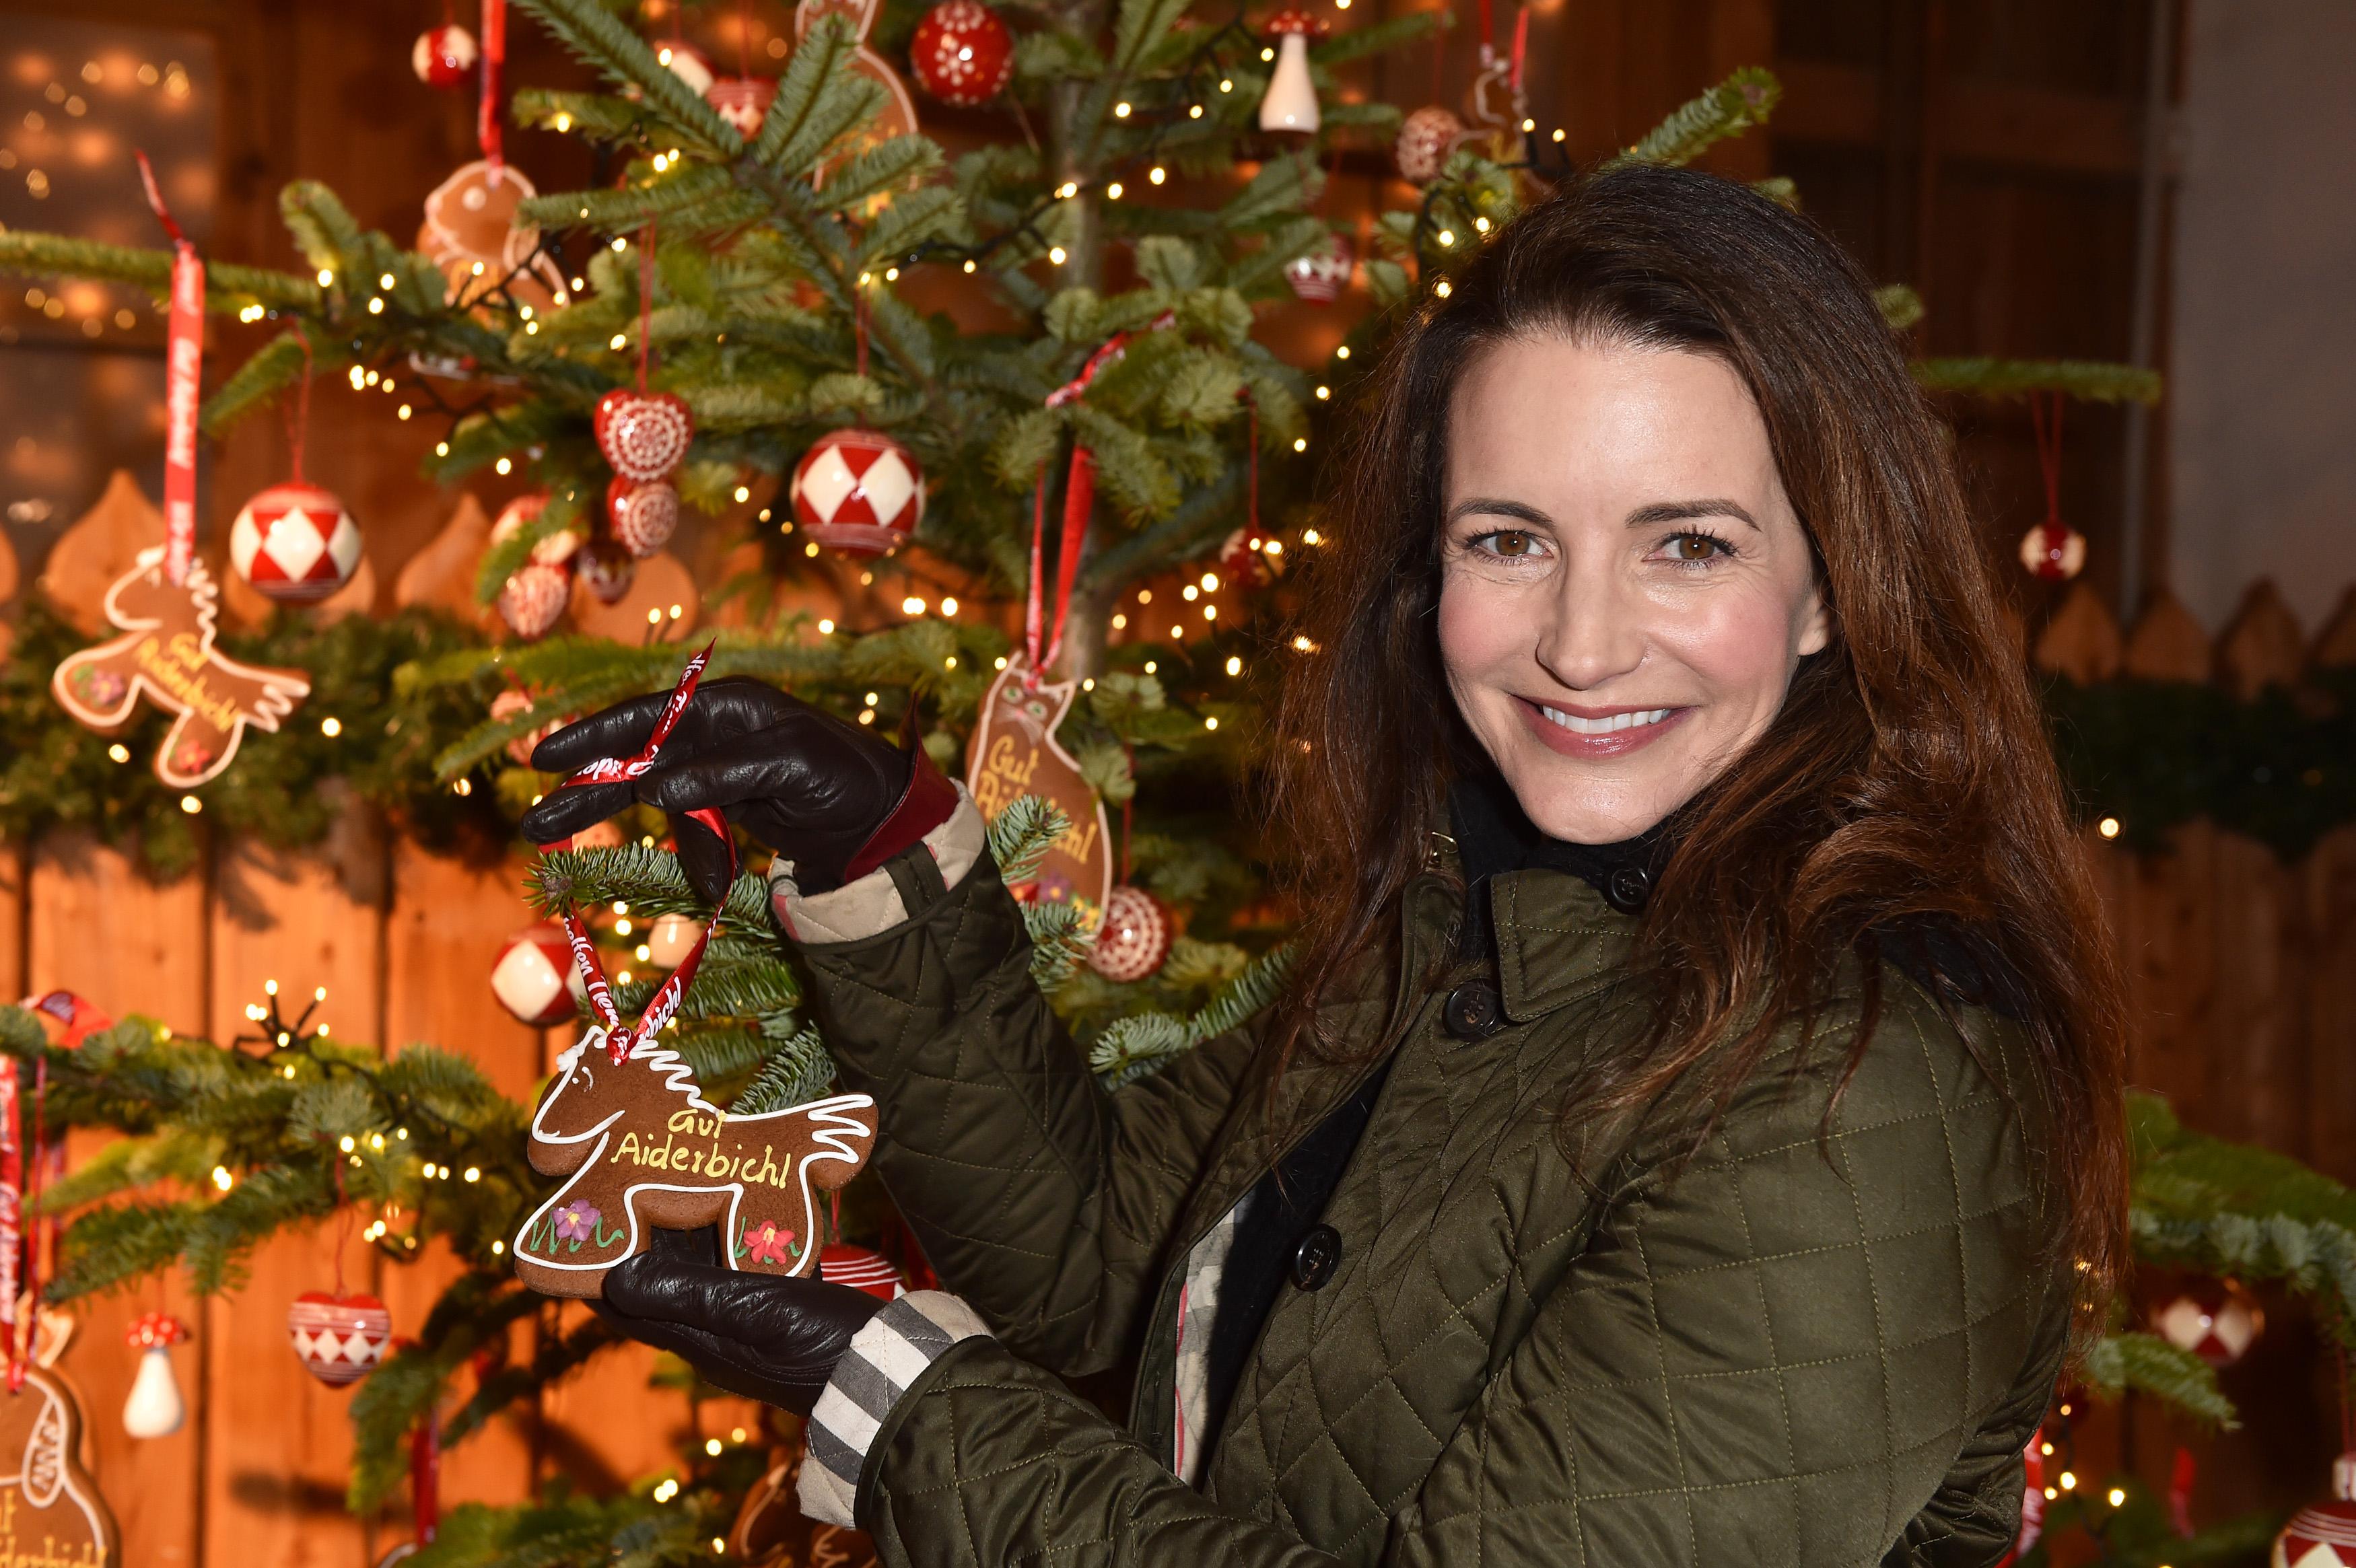 Gut Aiderbichl Christmas Market 2017 Opening